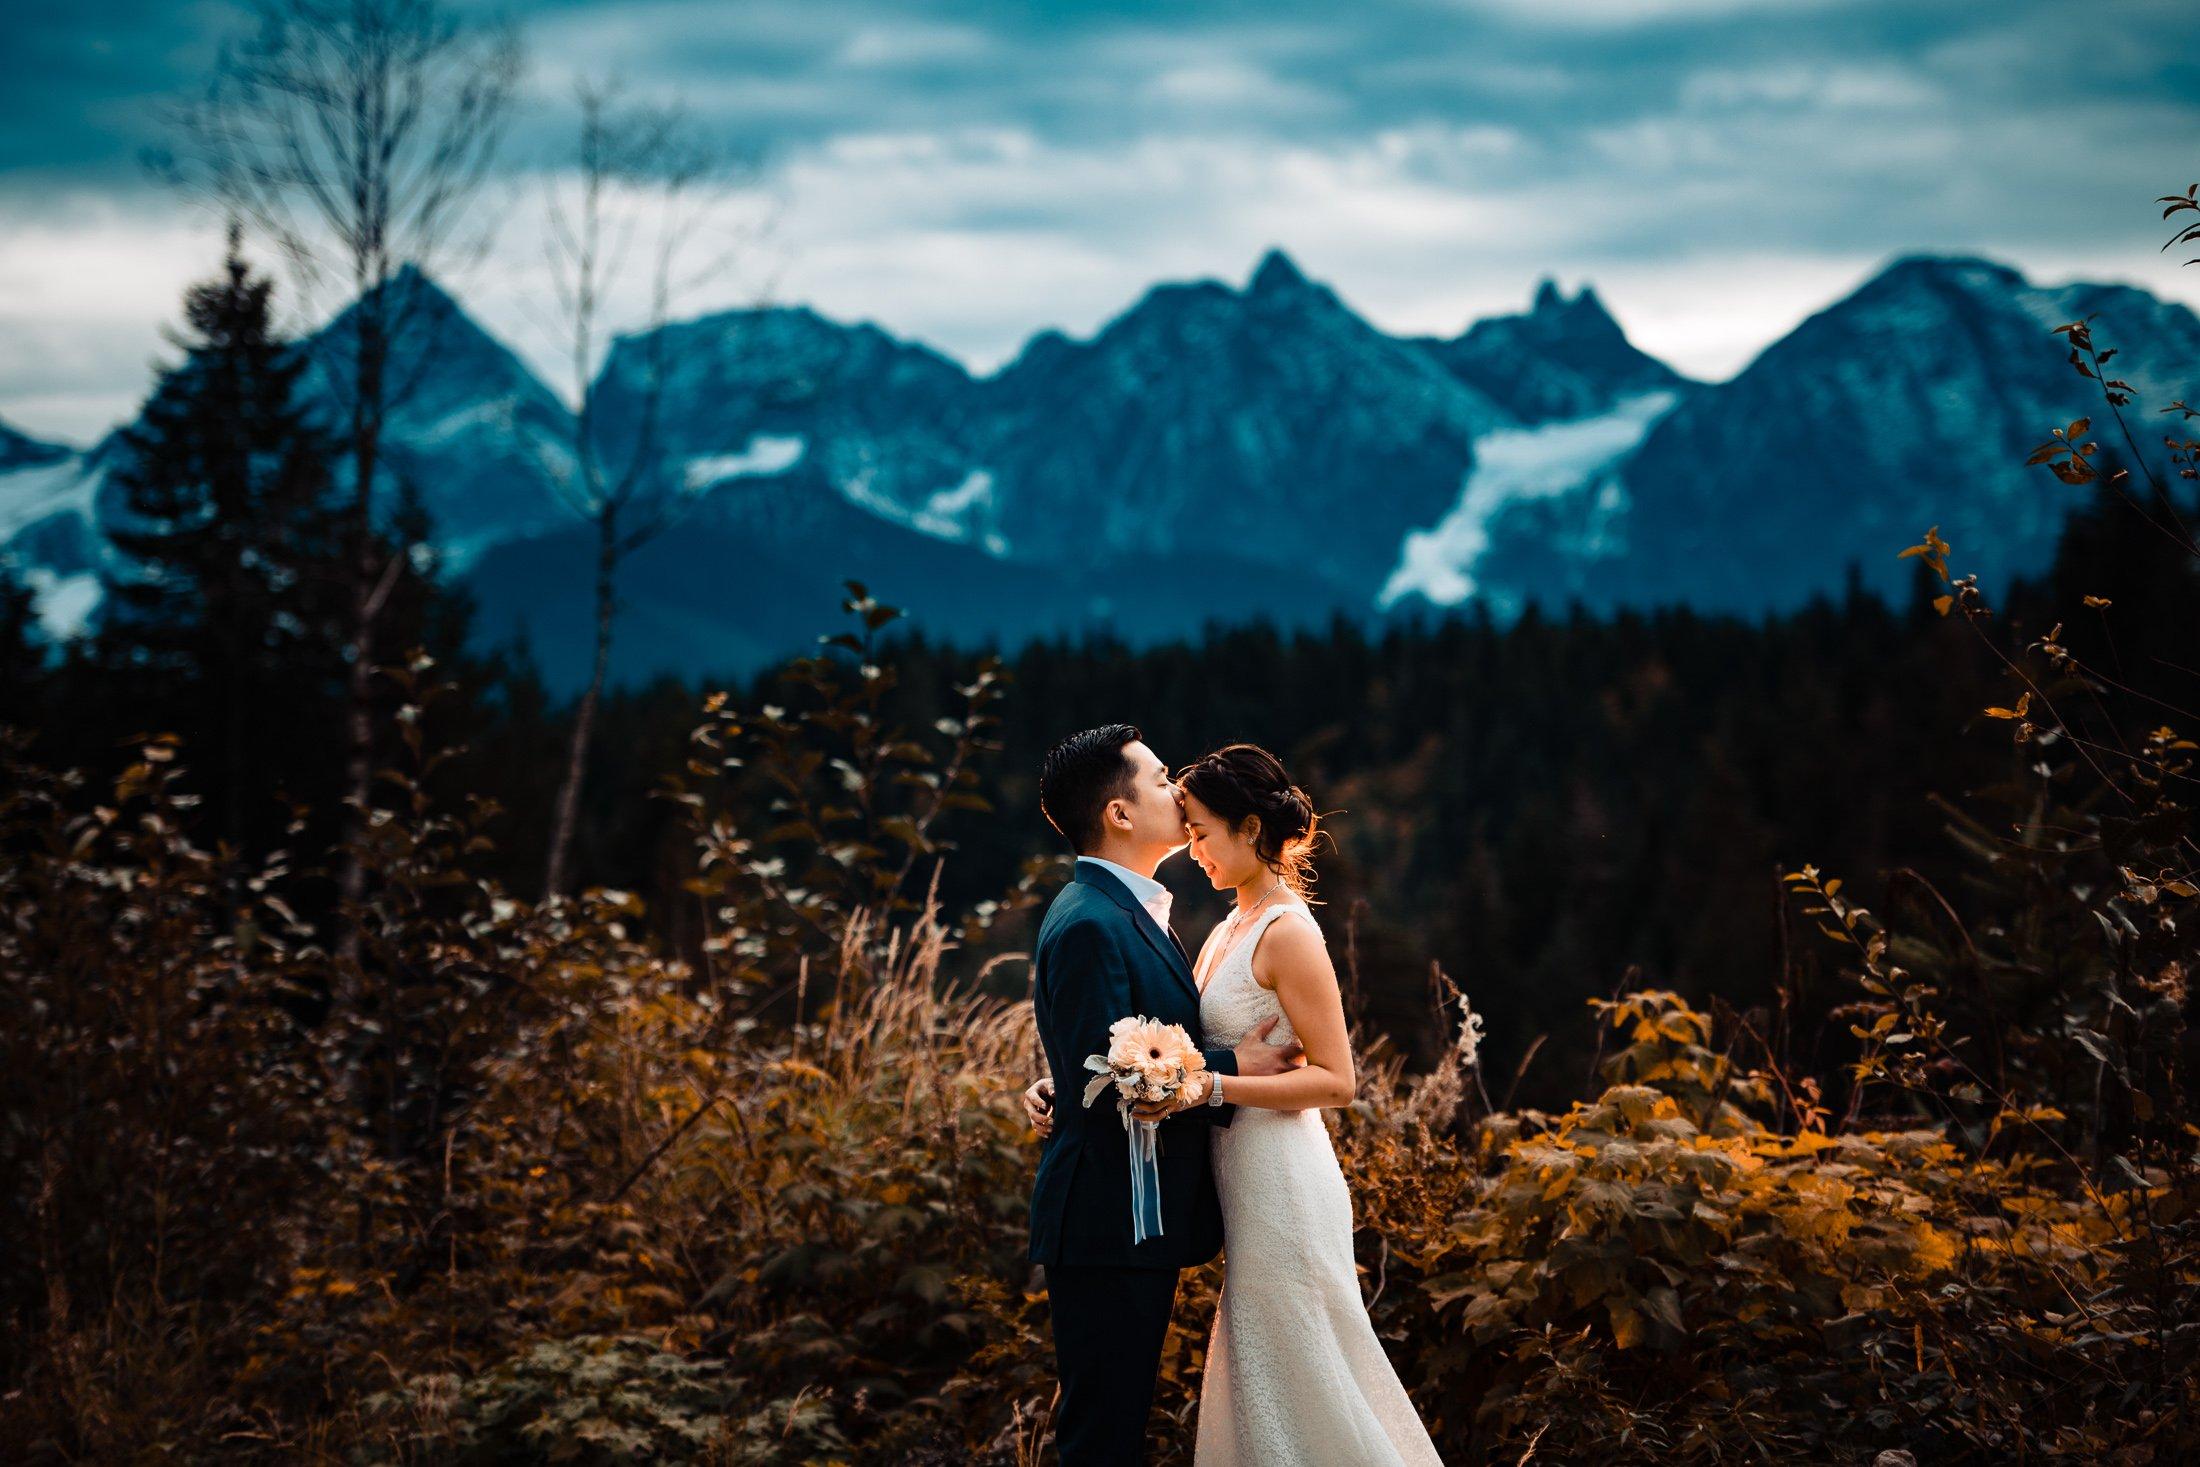 004 - adventure wedding vancouver